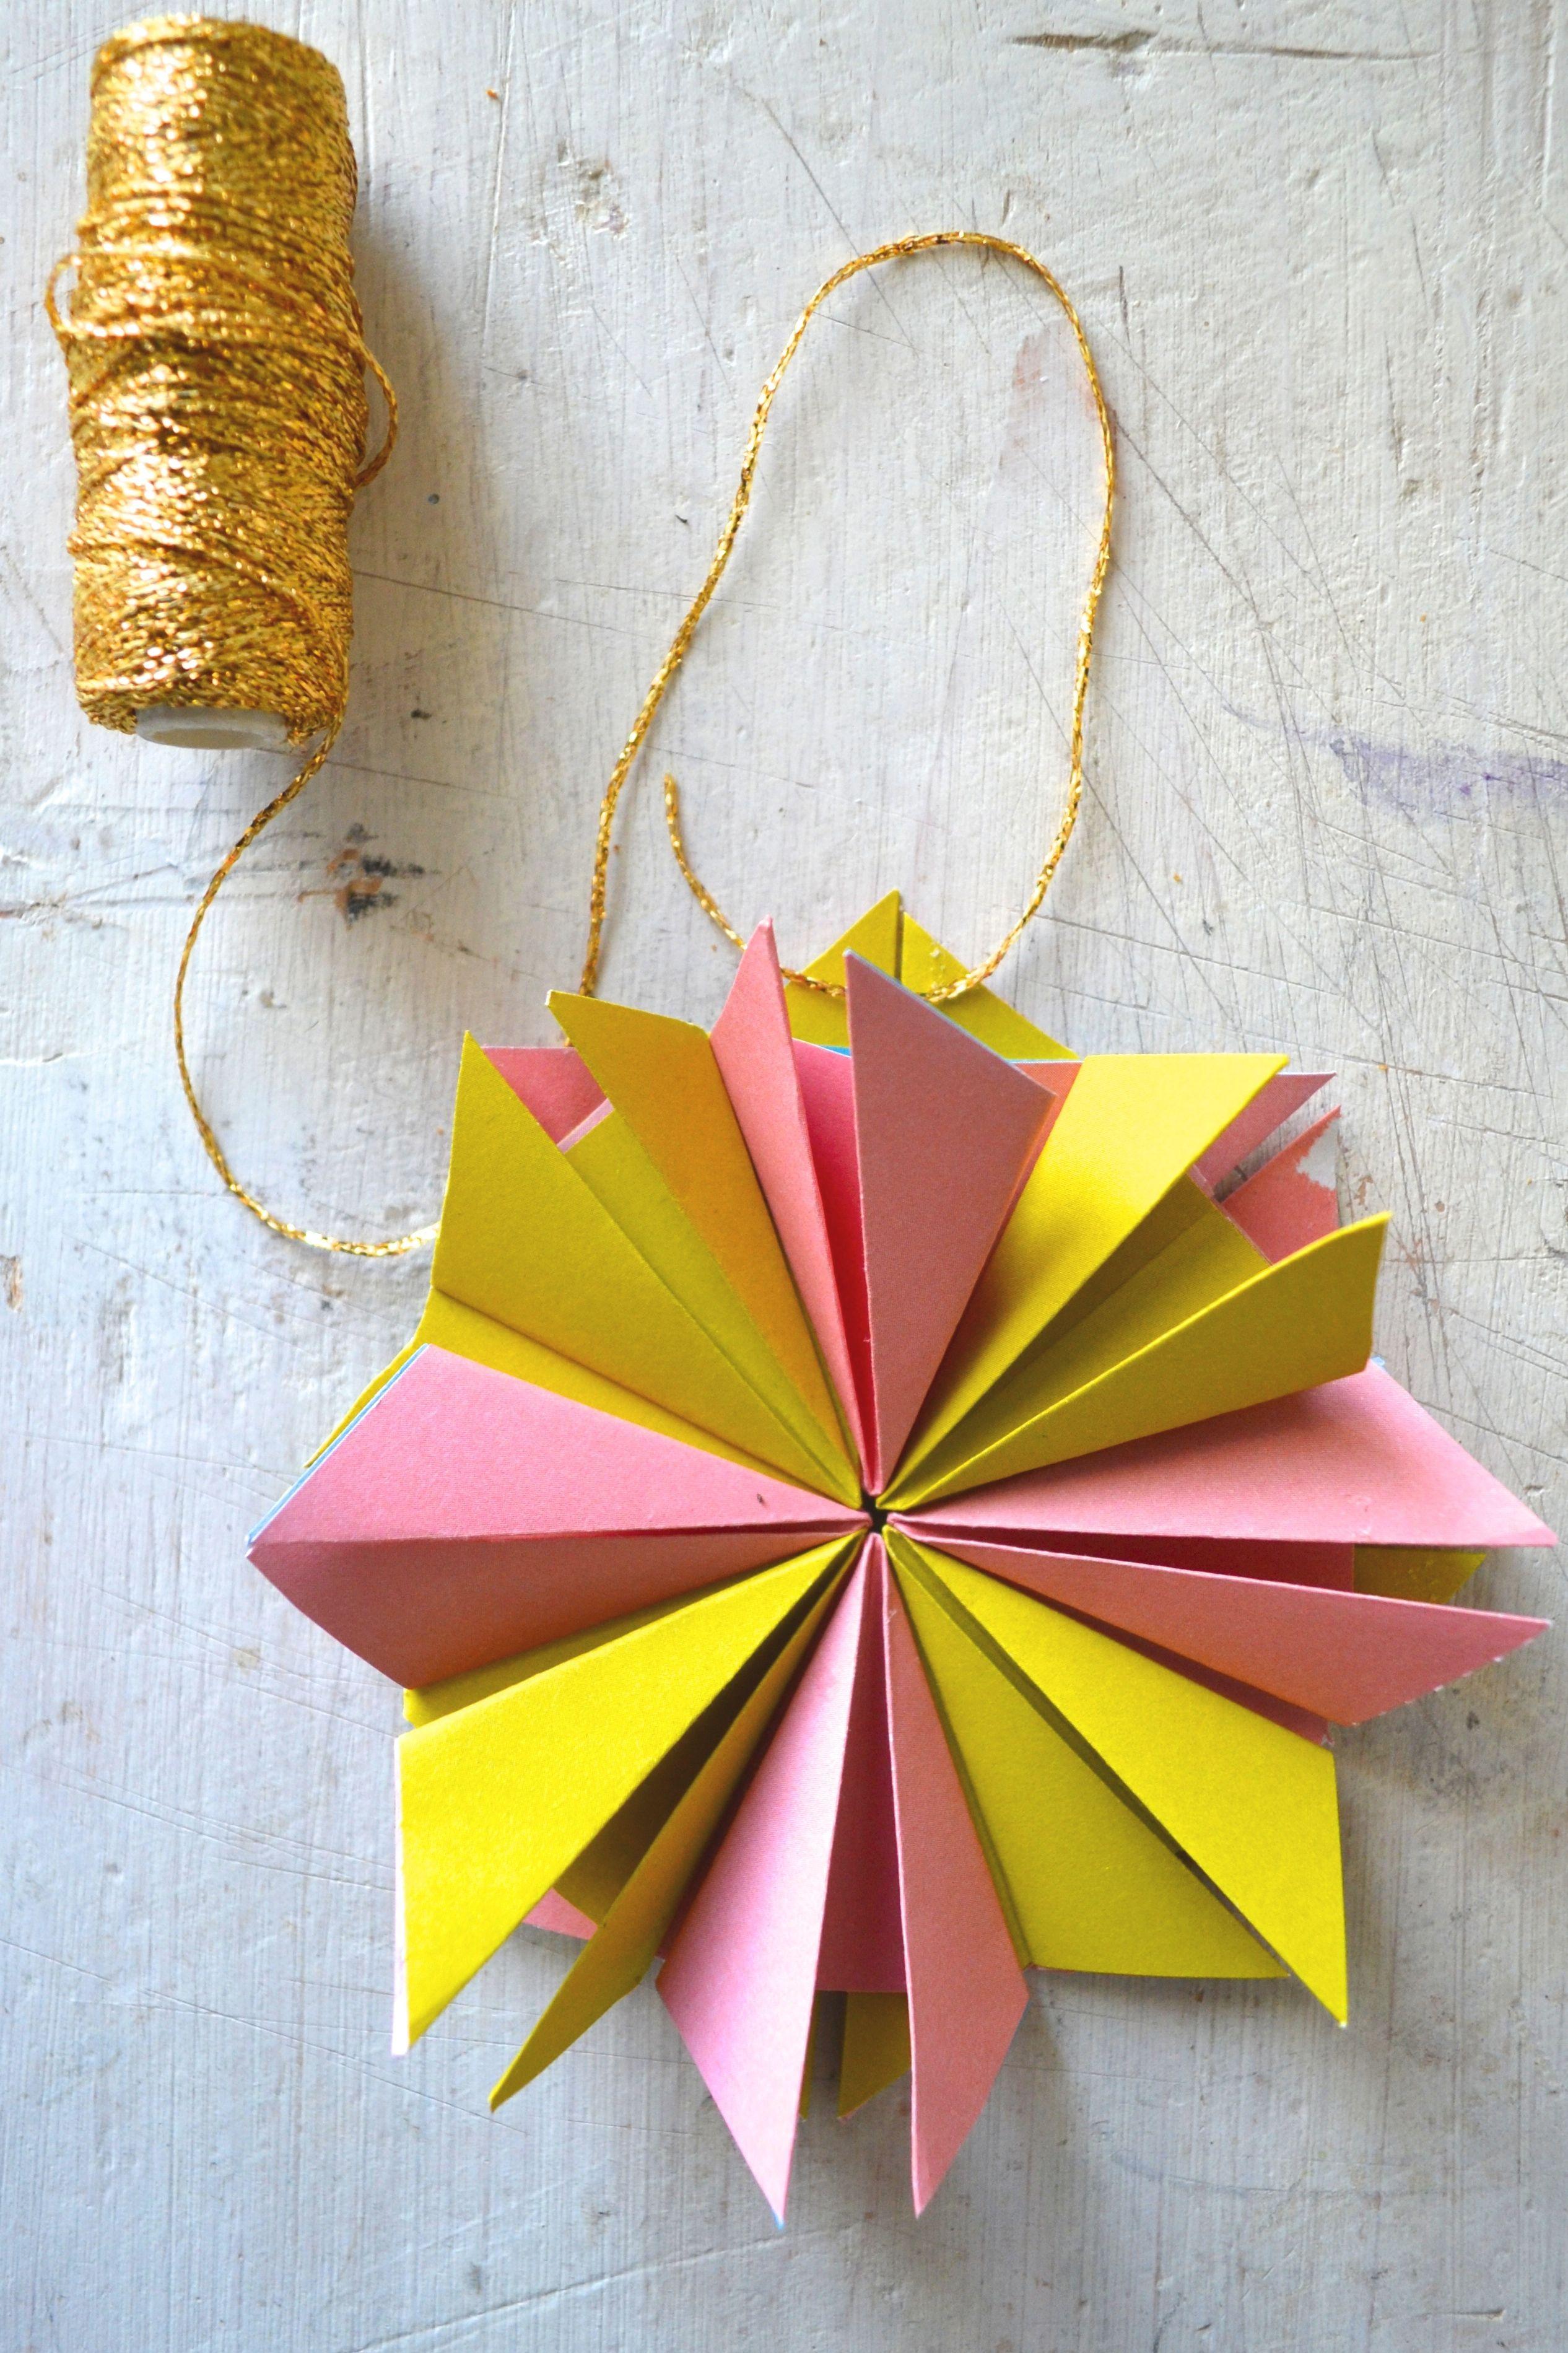 Genoeg Papier-vouw-idee 1 - Flow Magazine NL @RC48